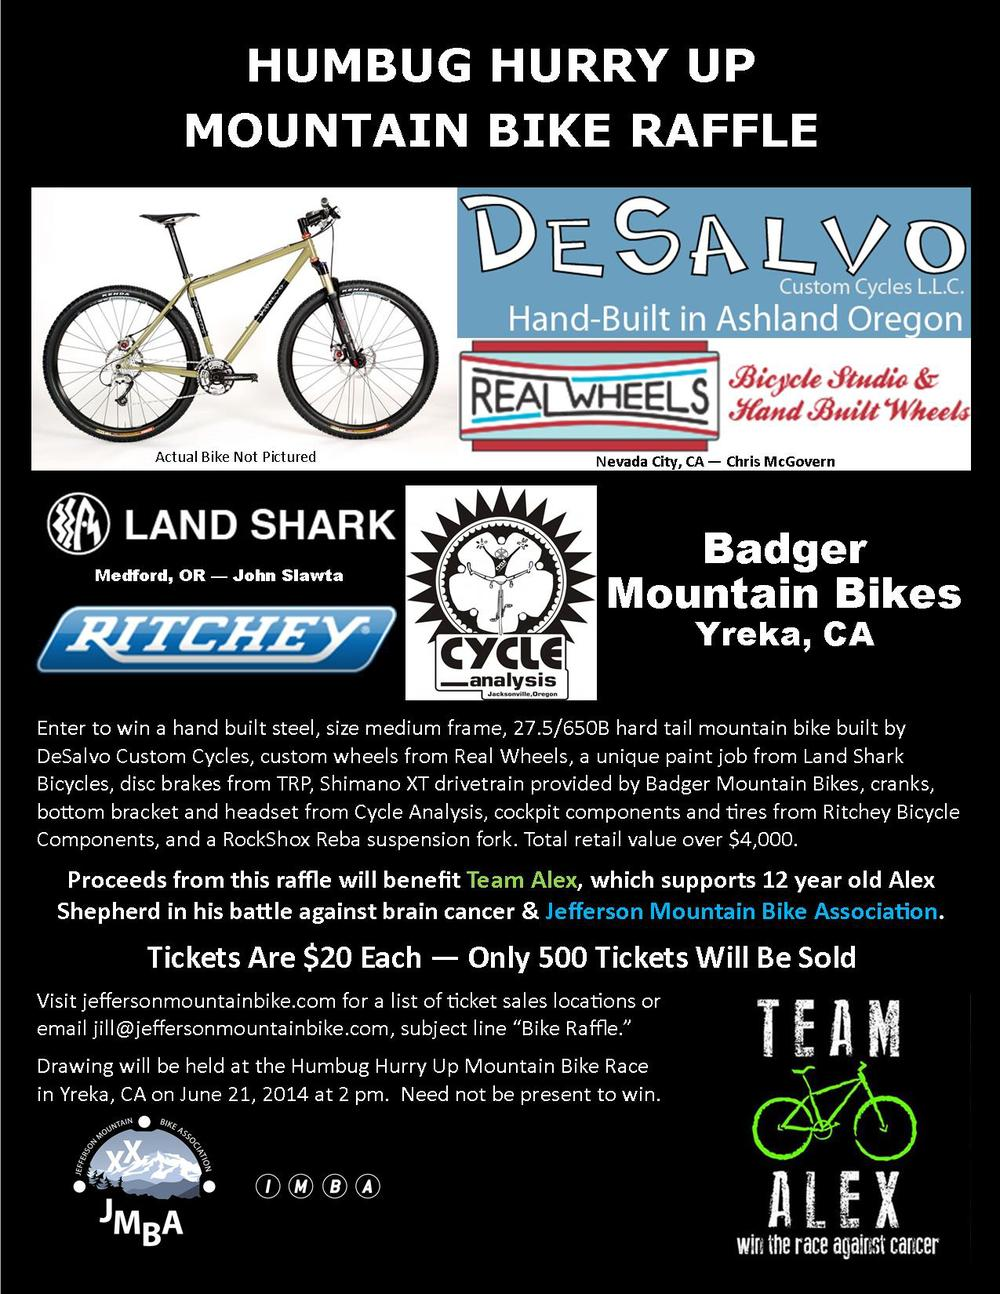 Jefferson Mountain Bike Association teams up with TEAM ALEX